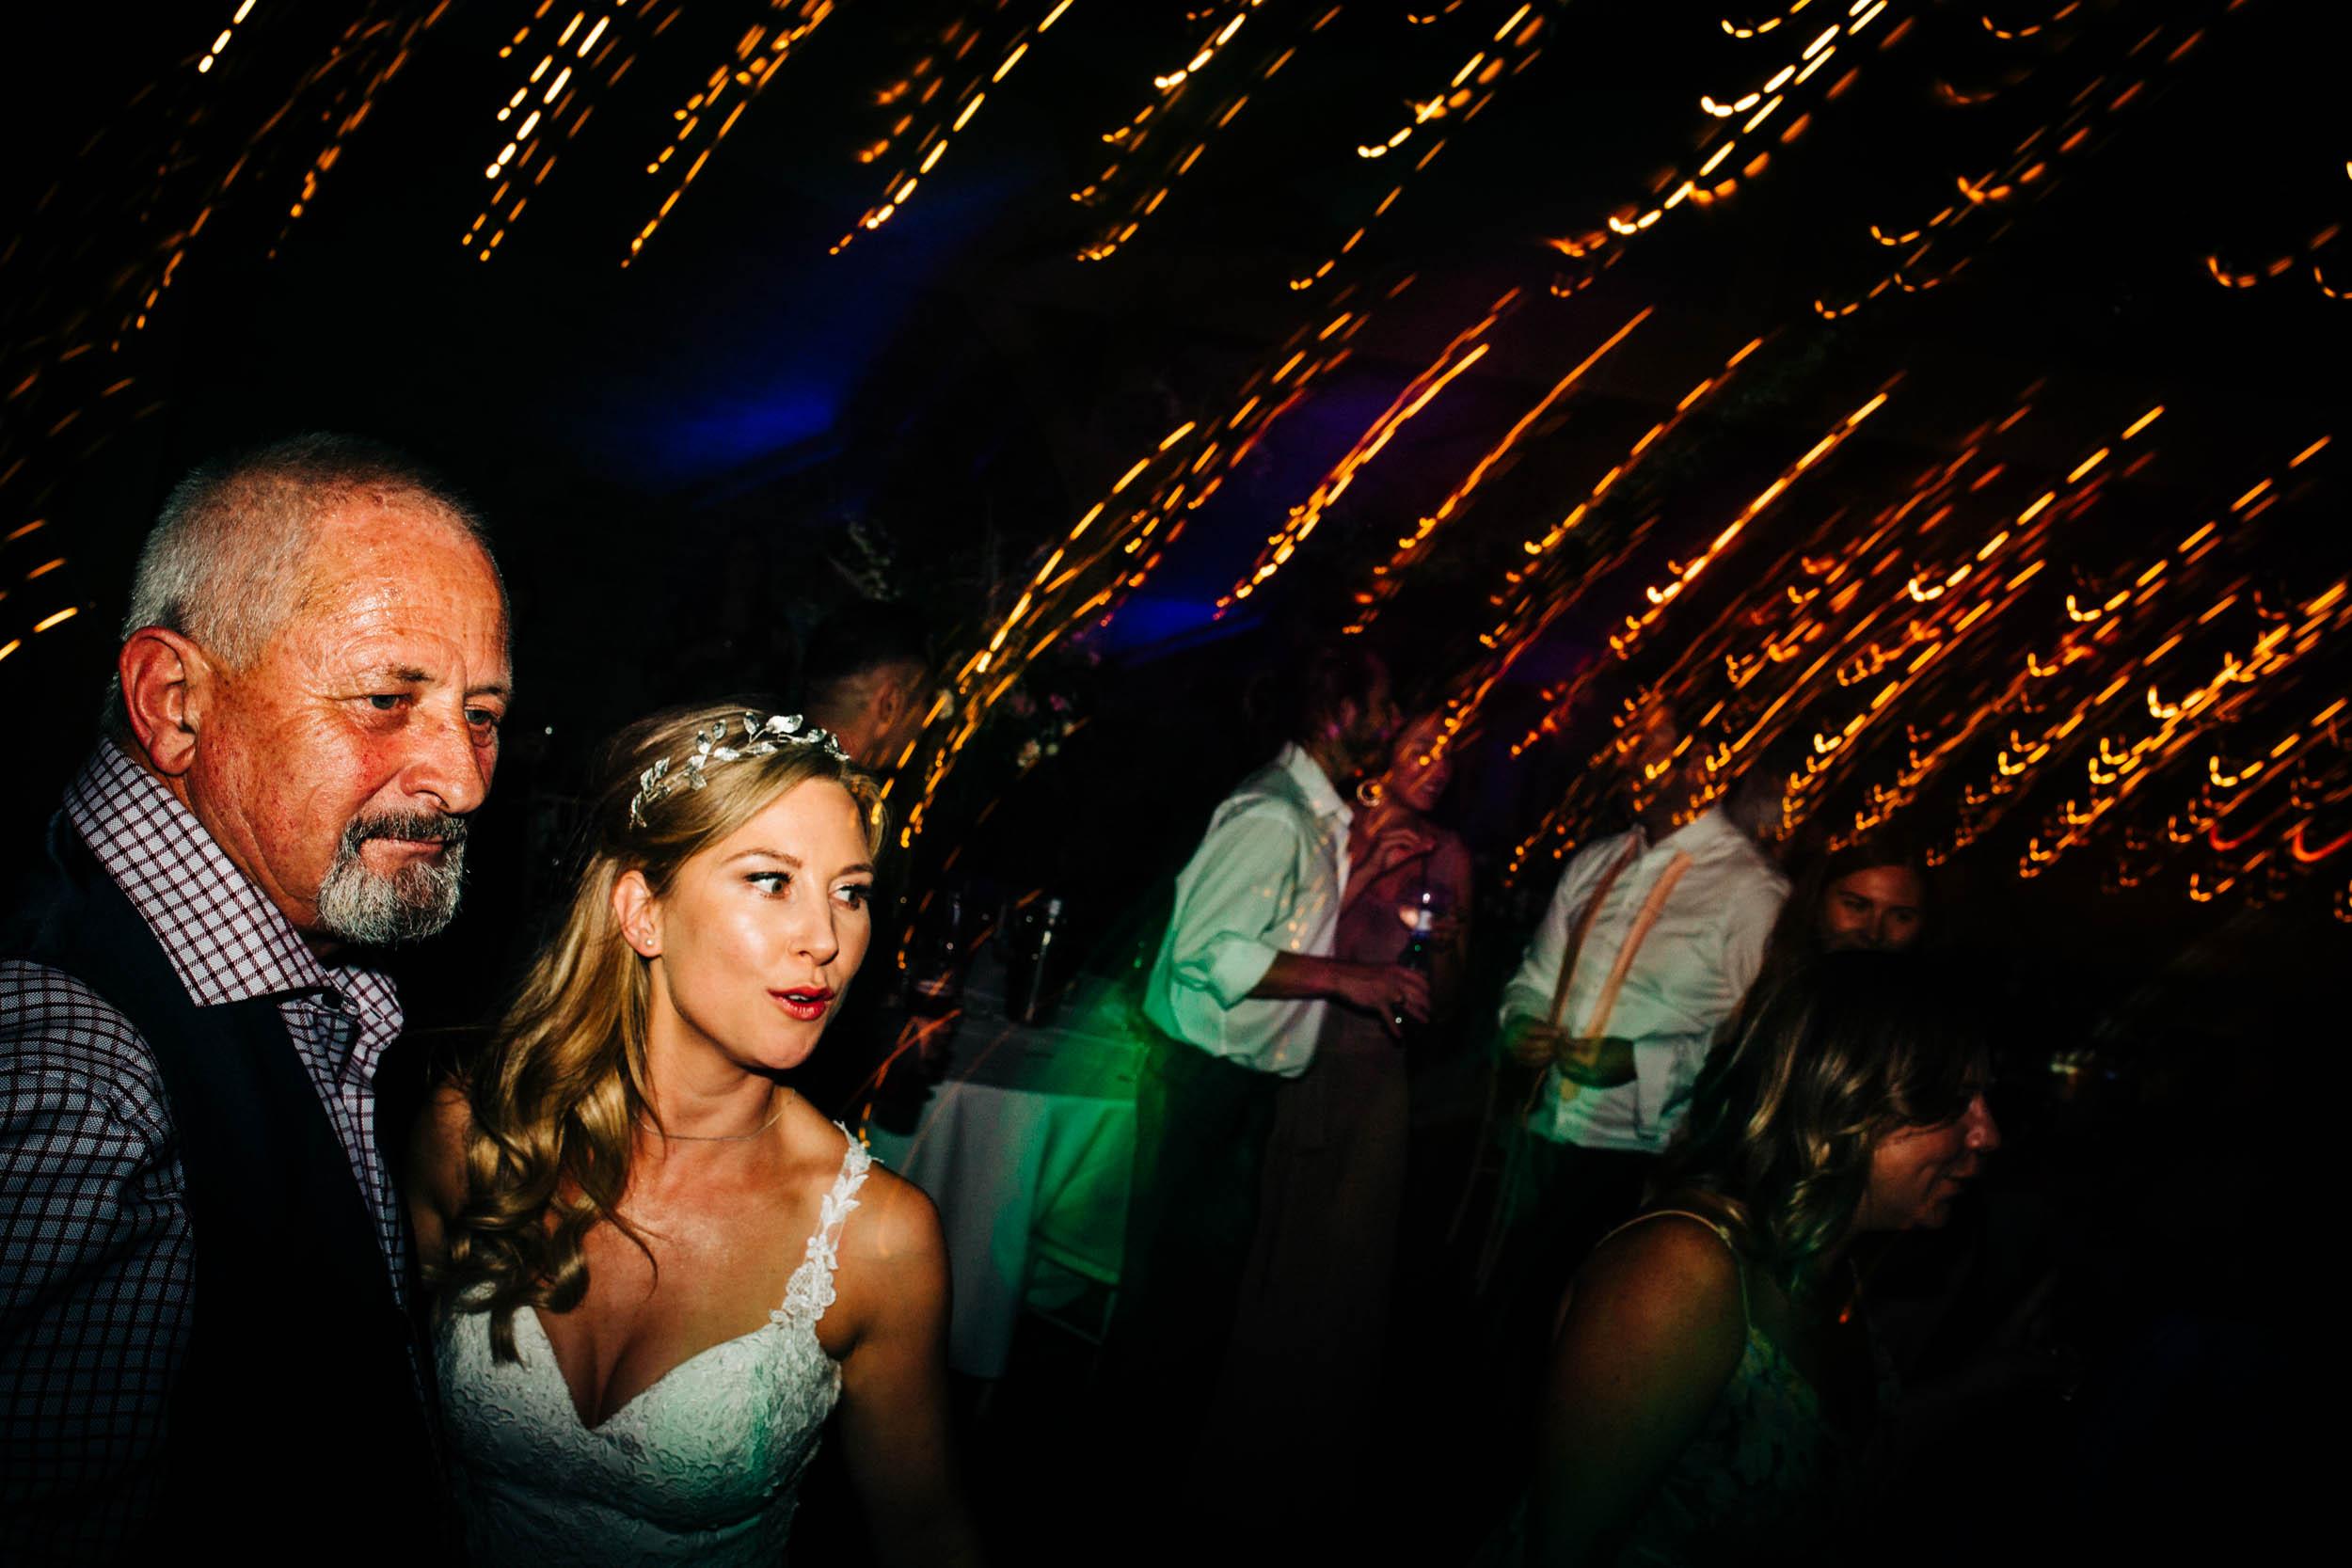 Alex_Sedgmond_Photography-SouthWalesWeddingPhotography-Wedding-Photographer-Cardiff-238.jpg